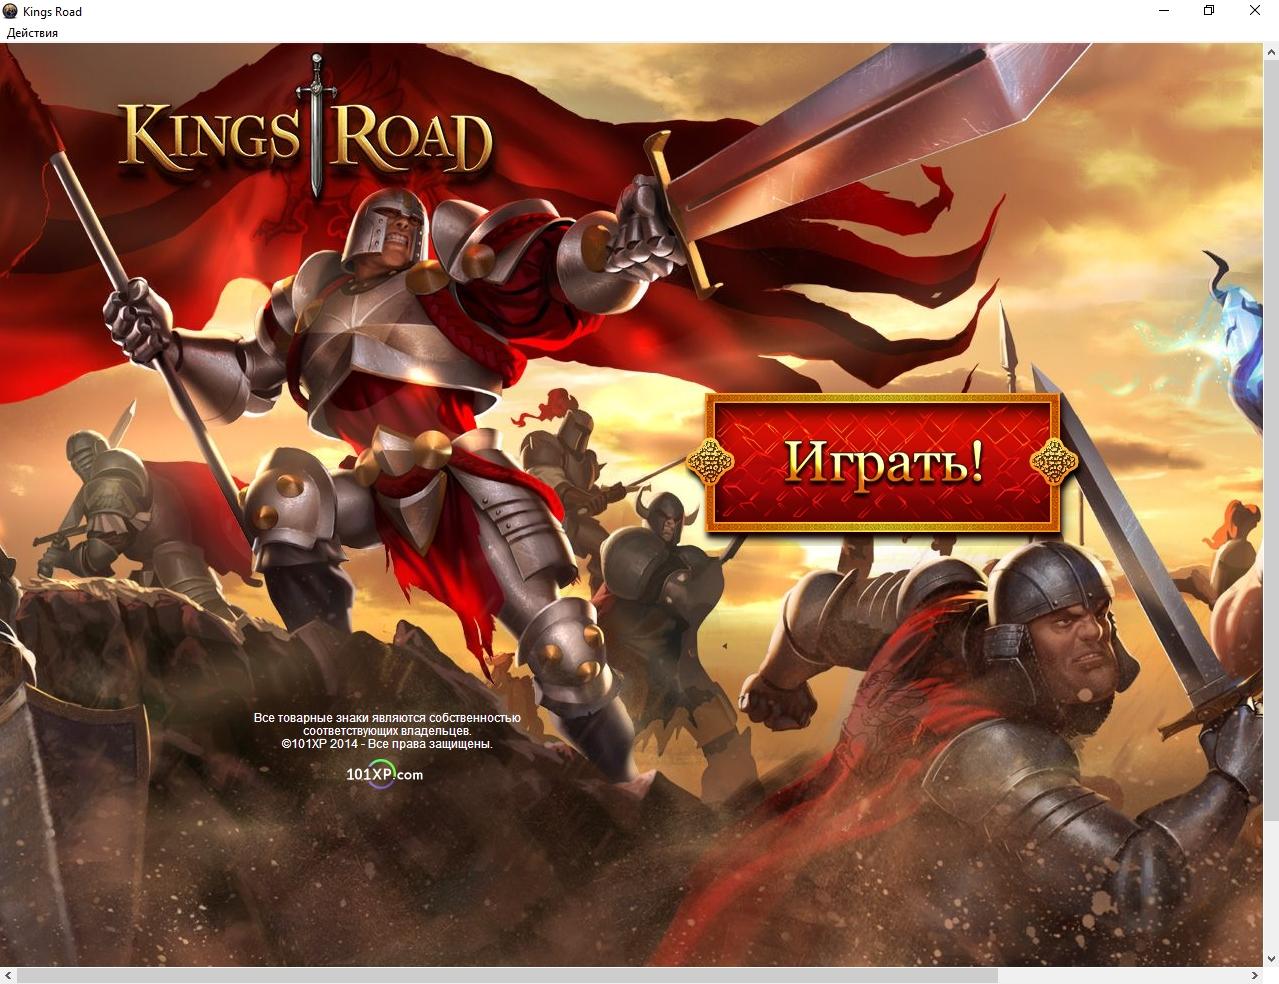 kingsroad-start-igry